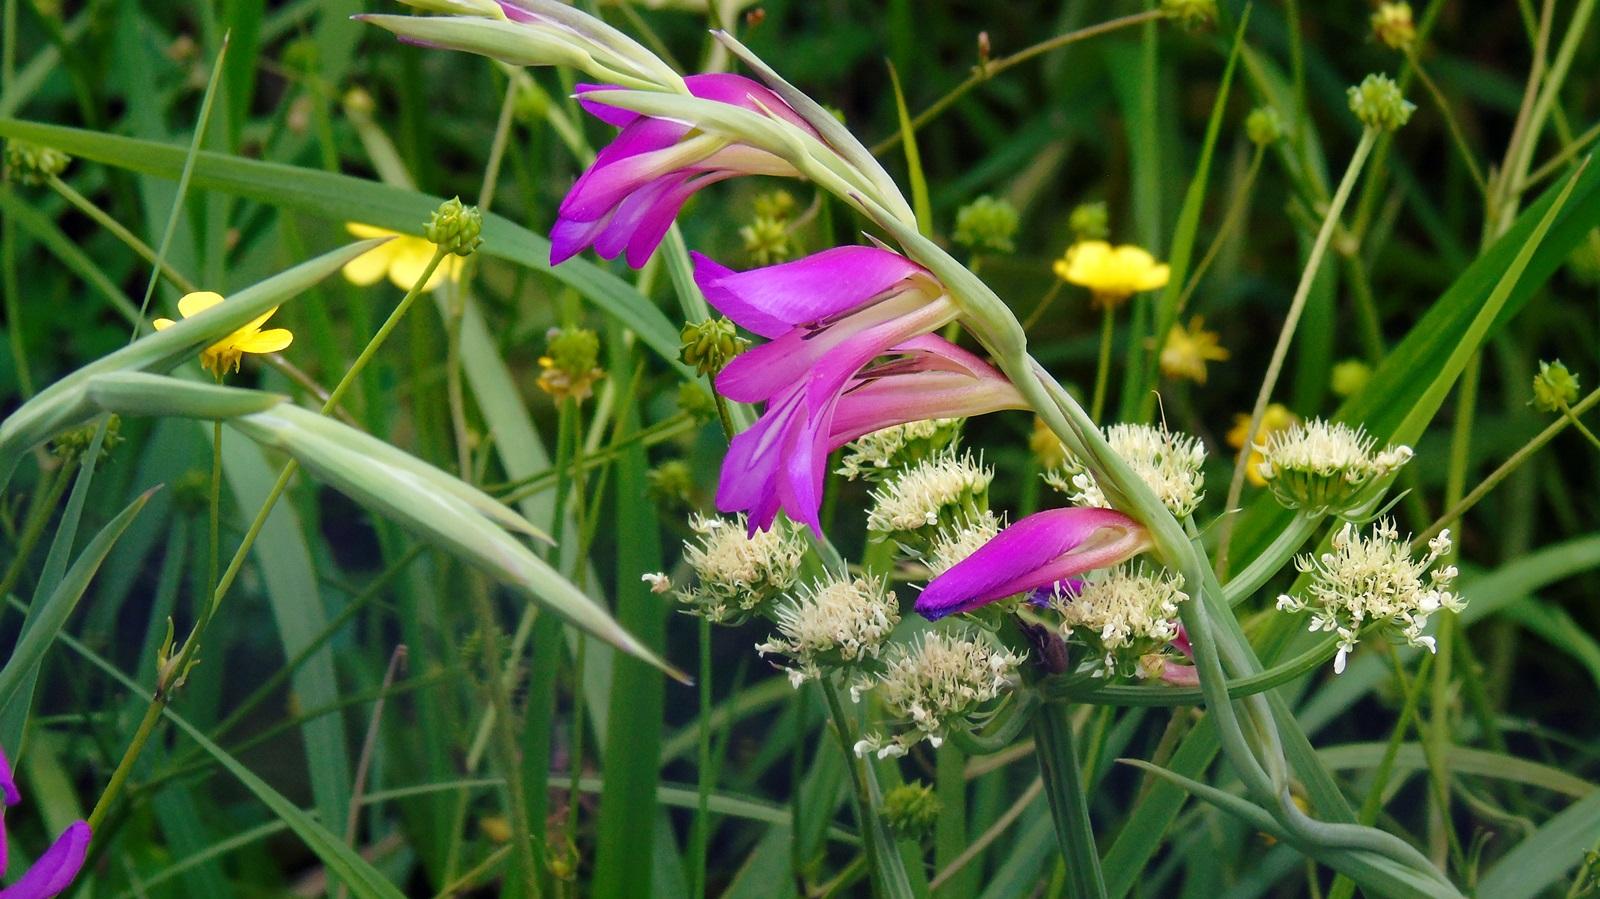 1 gladiolus